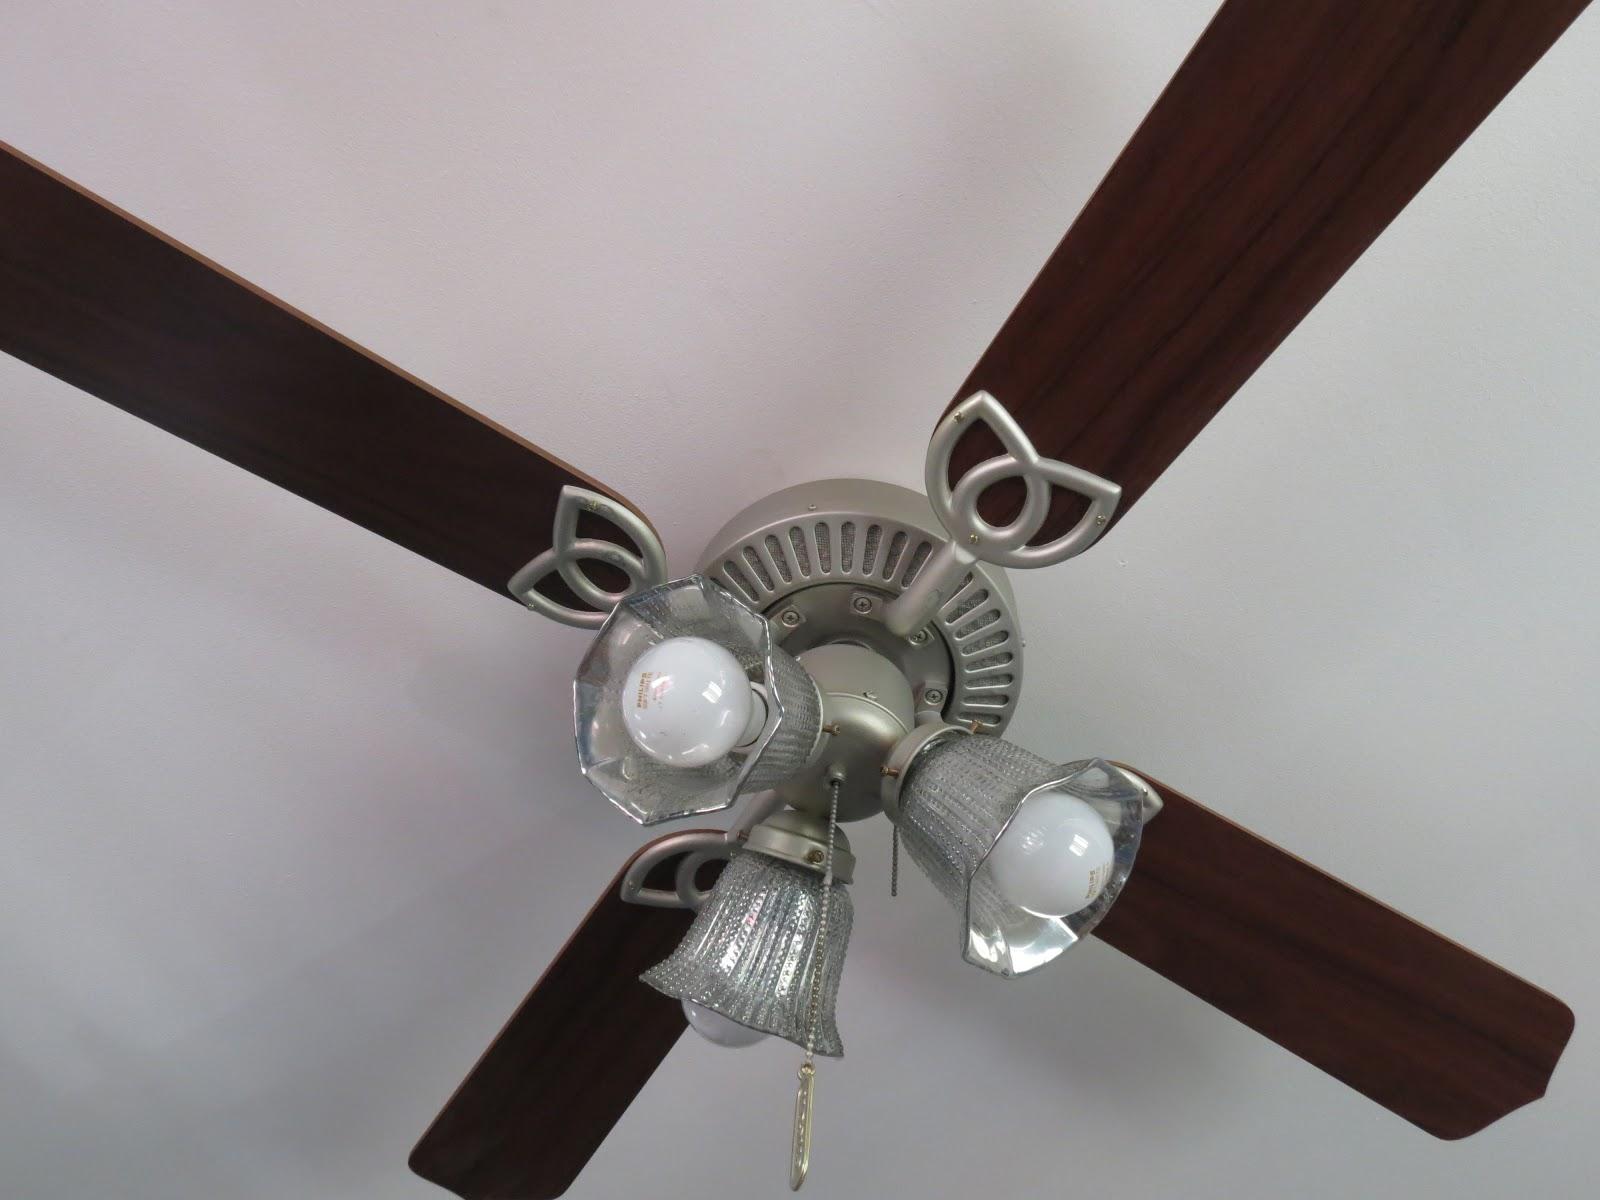 Diy Ceiling Fan : Walks like rain serious upcycle ceiling fan update diy